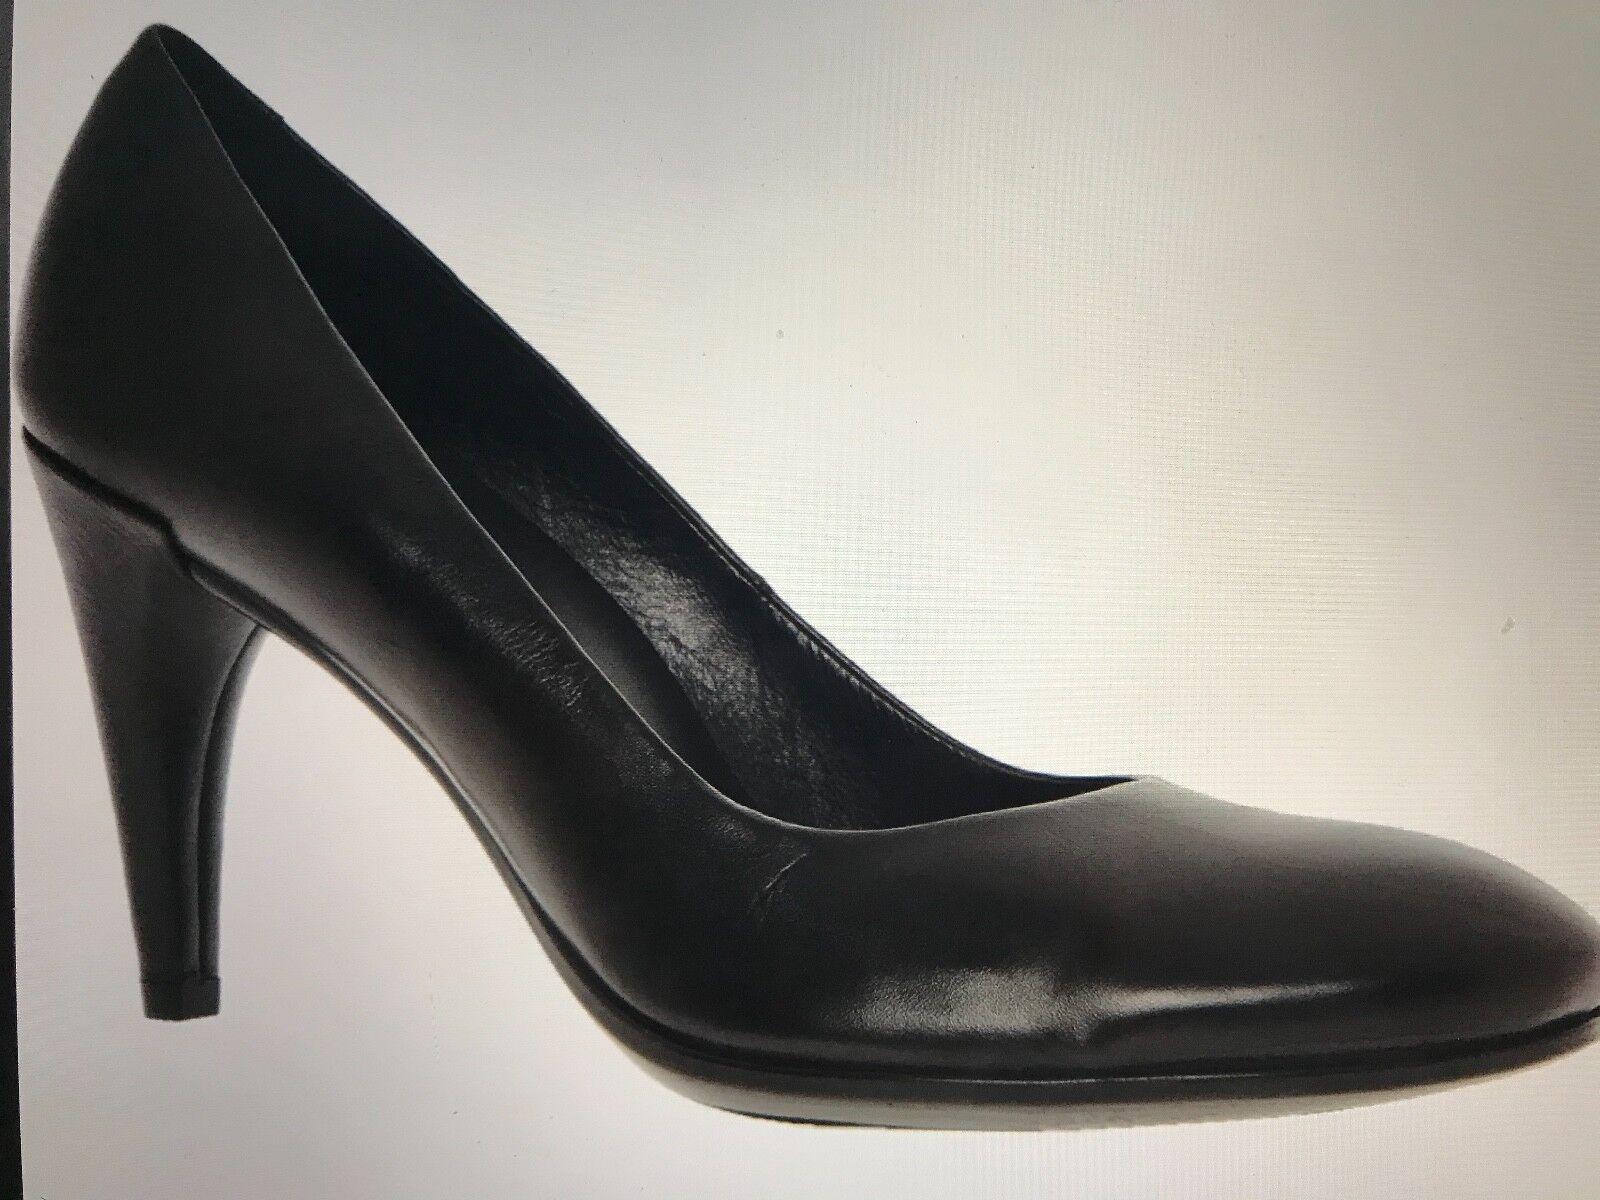 Ecco Danish style Größe 6 / / 6 39 schwarz Leder heeled schuhe fdbc4c